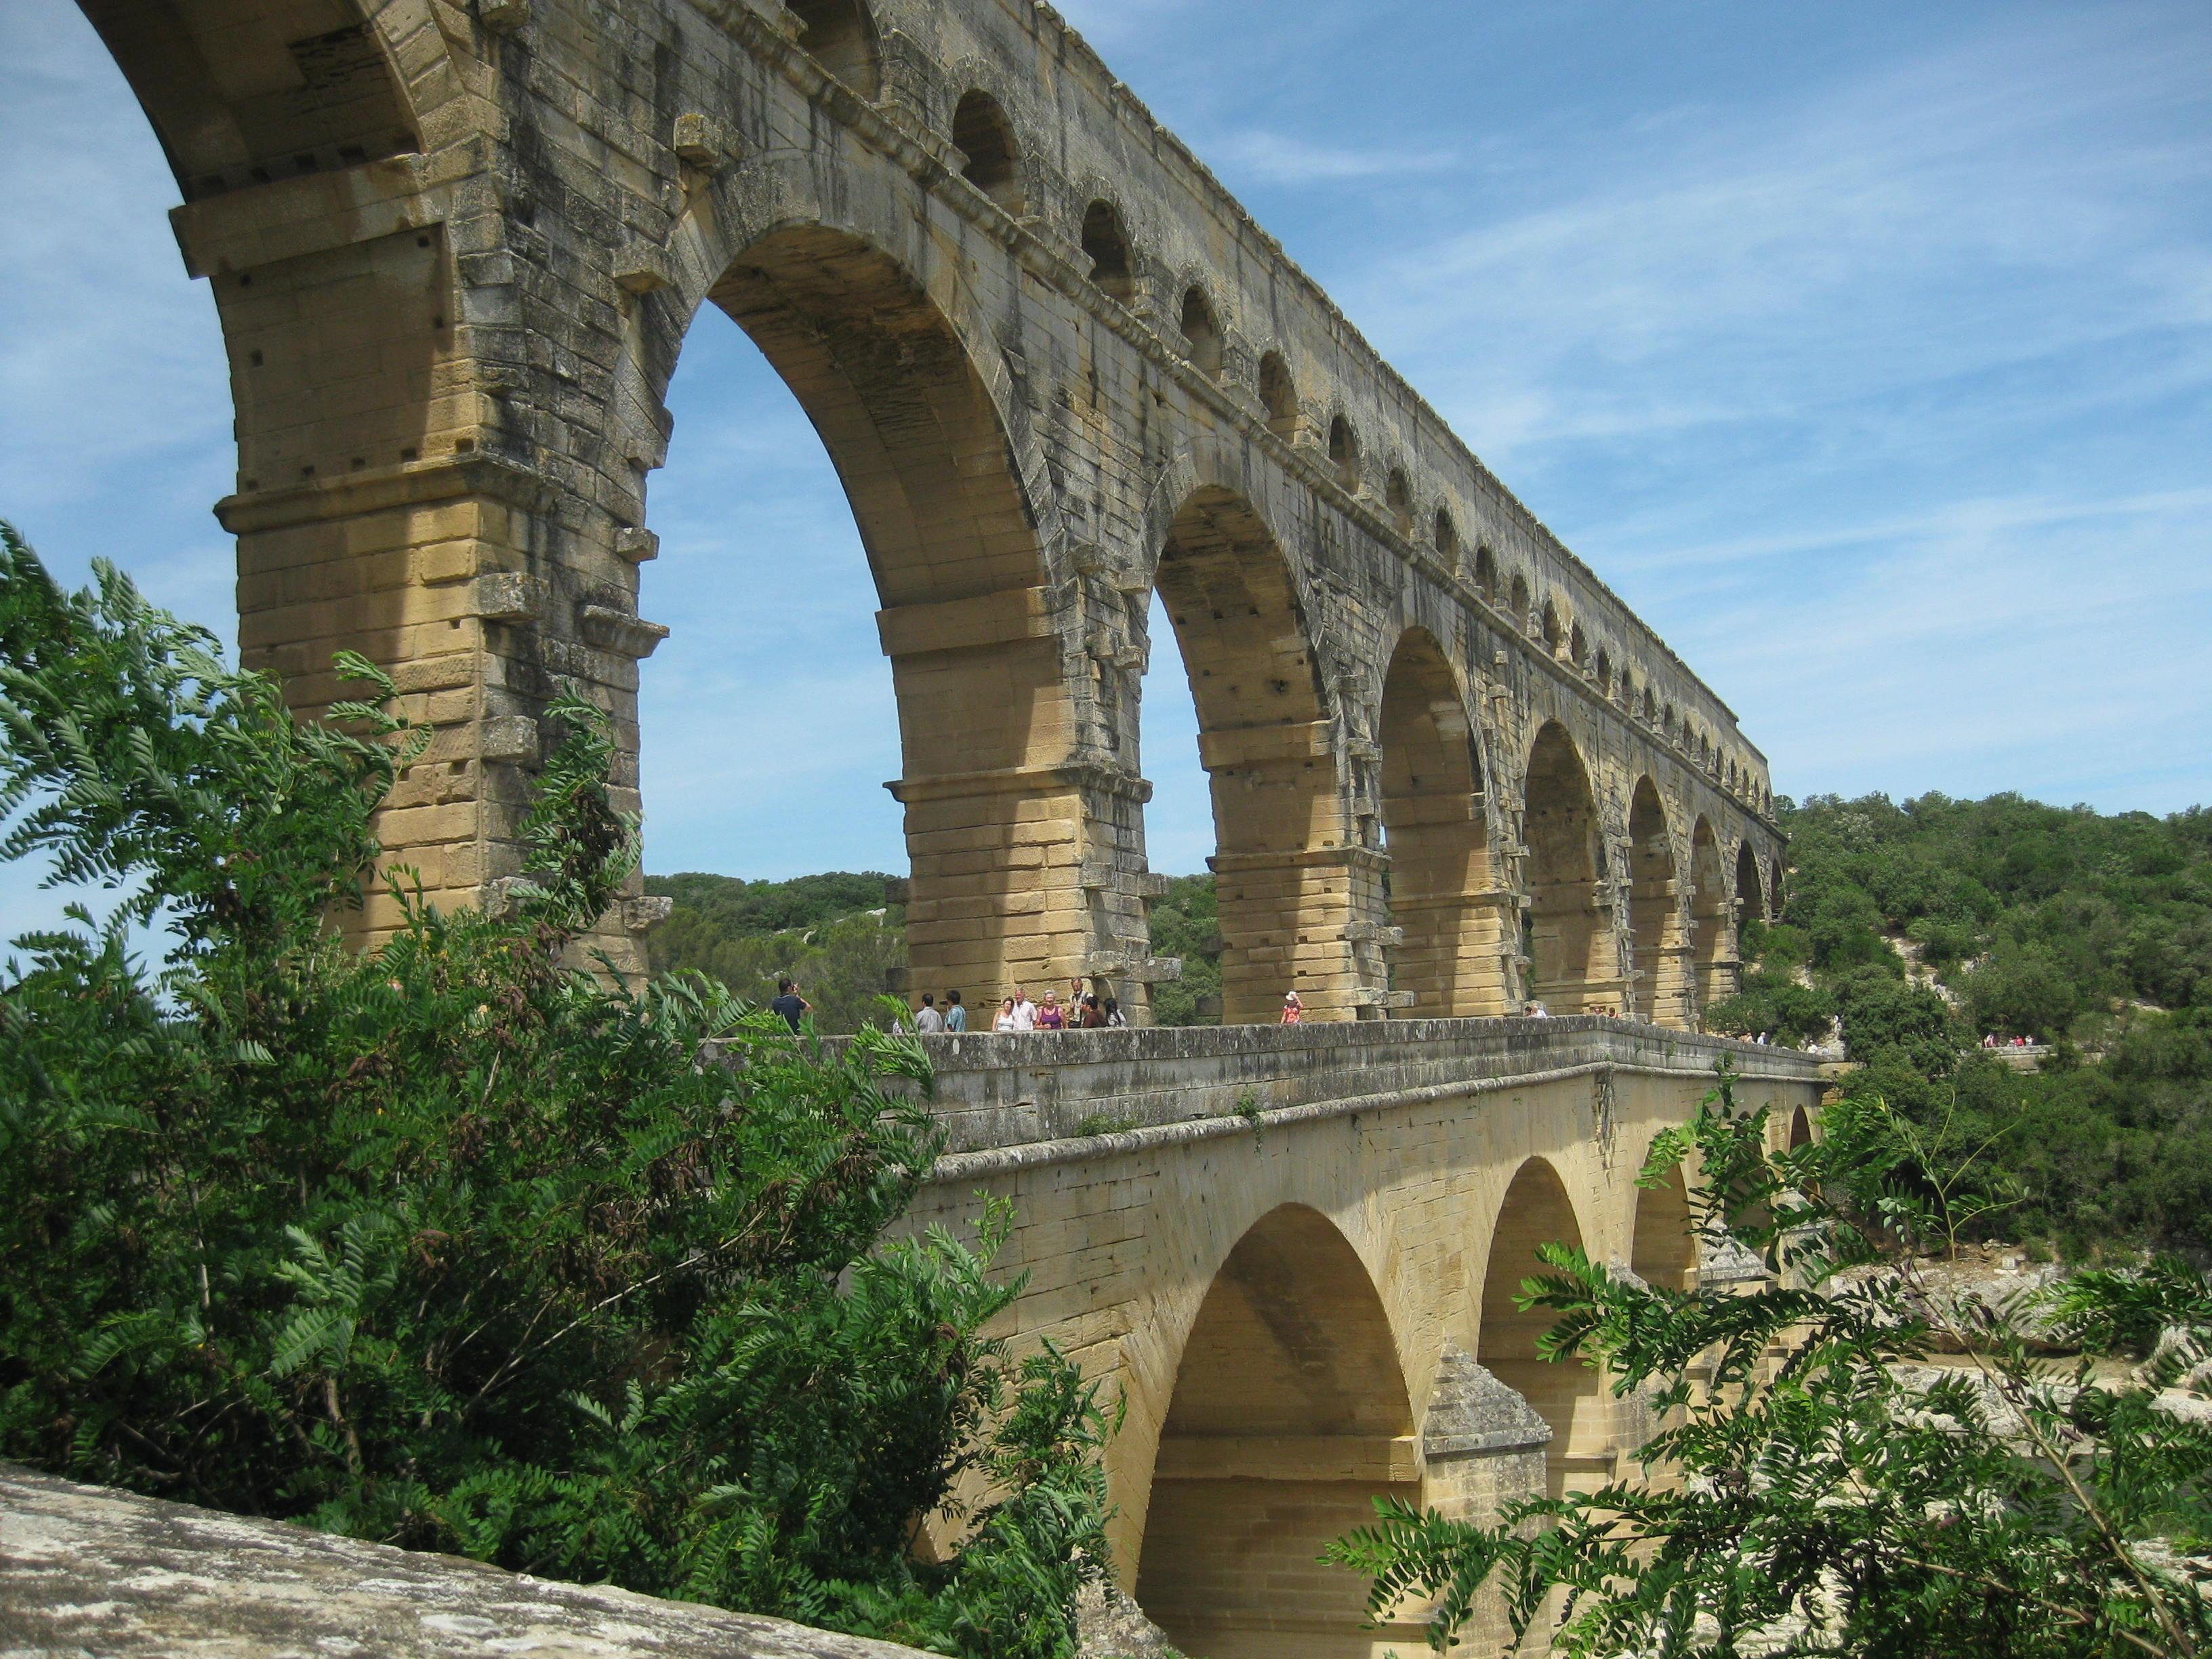 Pont du Gard viaduct Nimes Italy